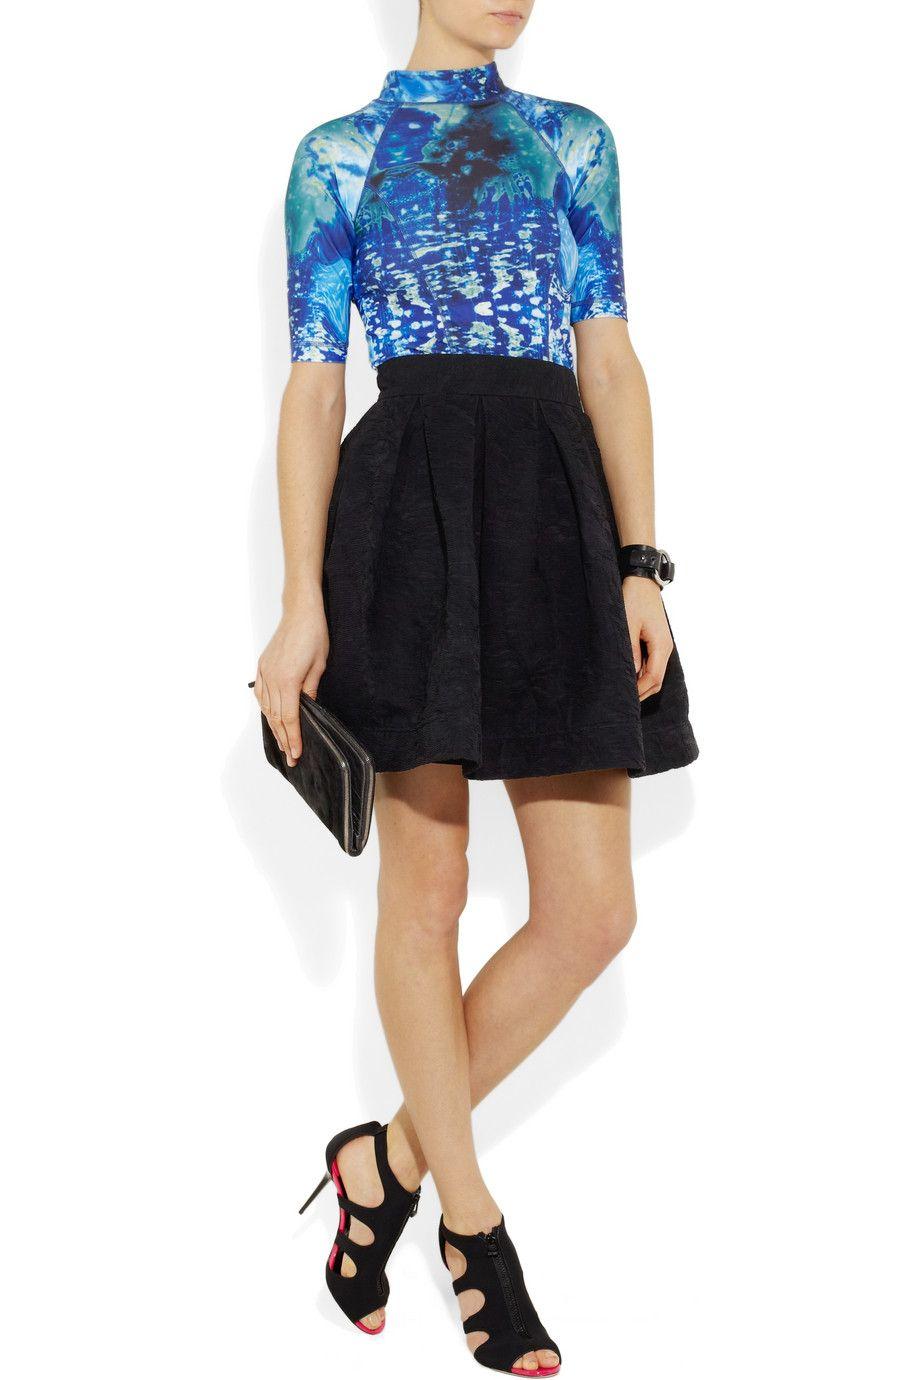 Scuba inspired top -- McQ Alexander McQueen. Skirt, Zac Posen. Shoes, Jimmy  Choo. Clutch, Helmut Lang.   My Style Pinboard   Pinterest   Scubas, Zac po…